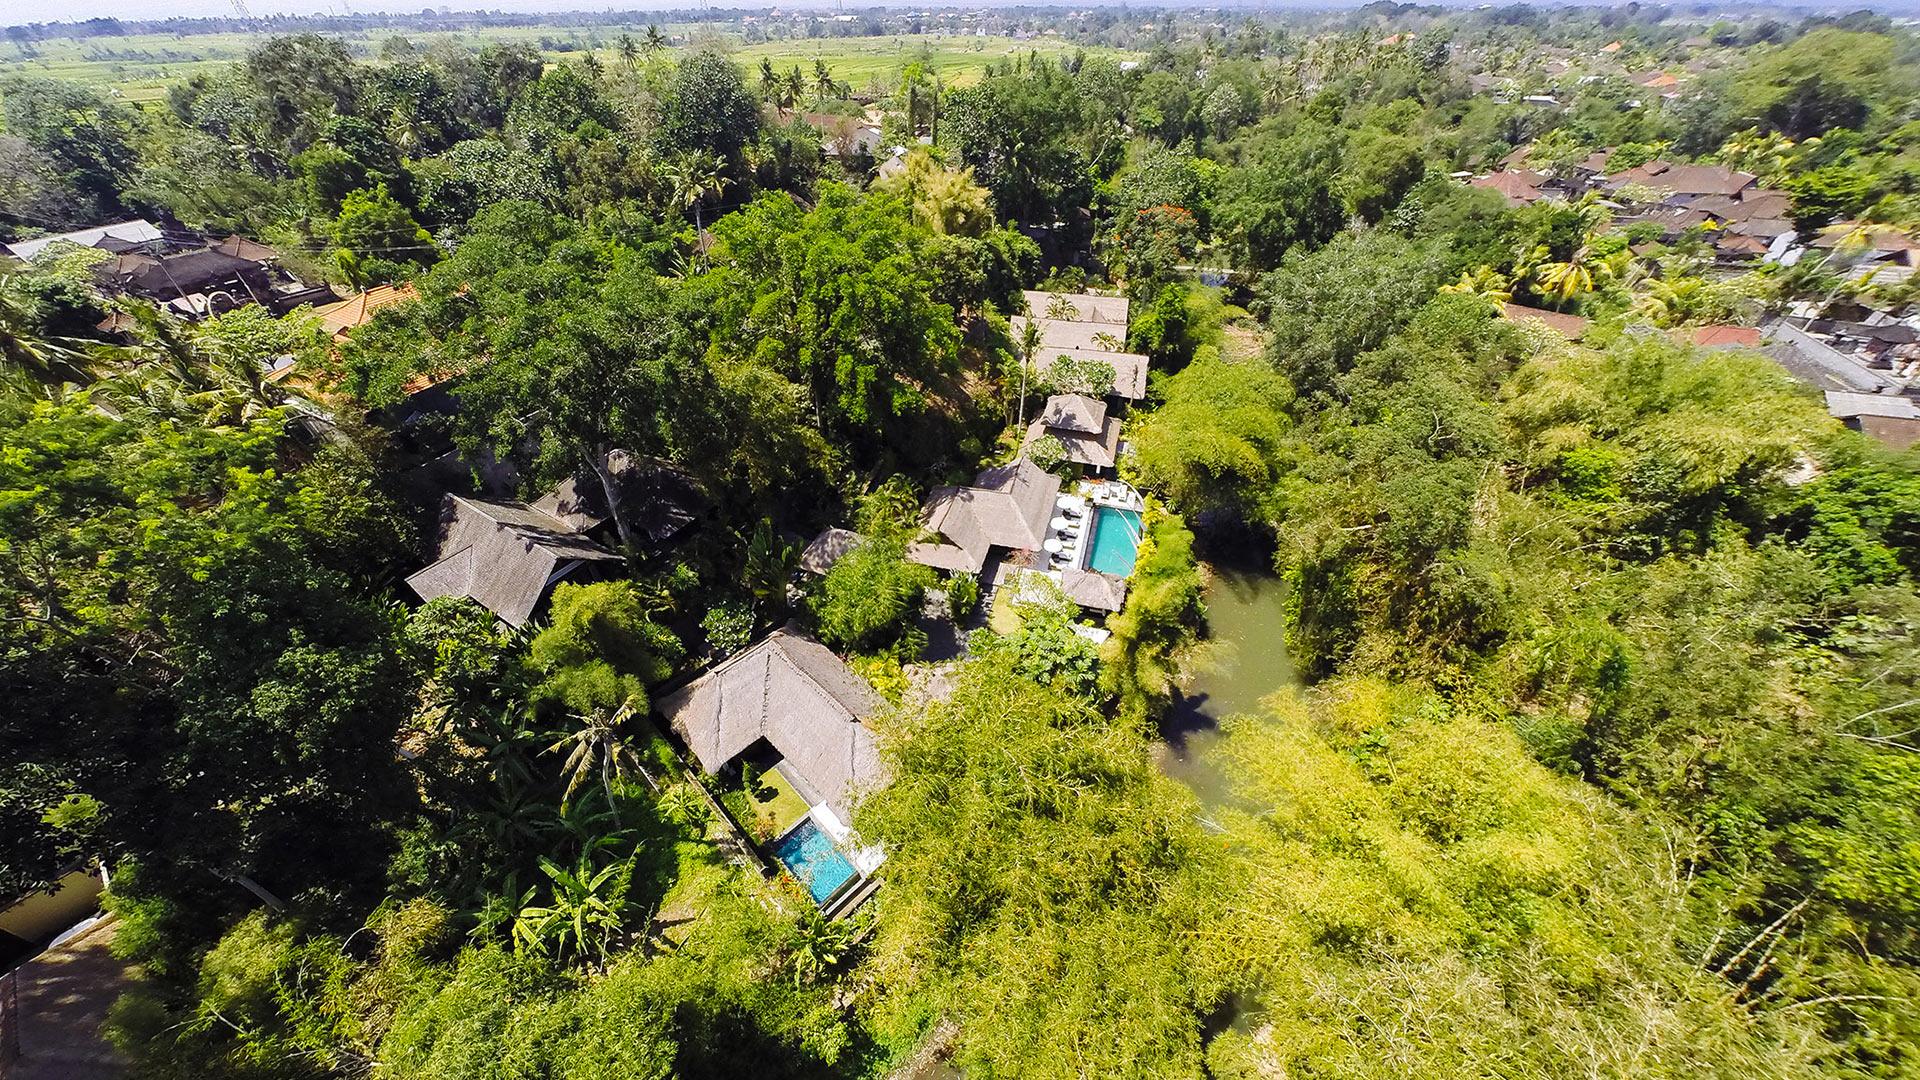 Villa Villa Maya, Rental in Bali